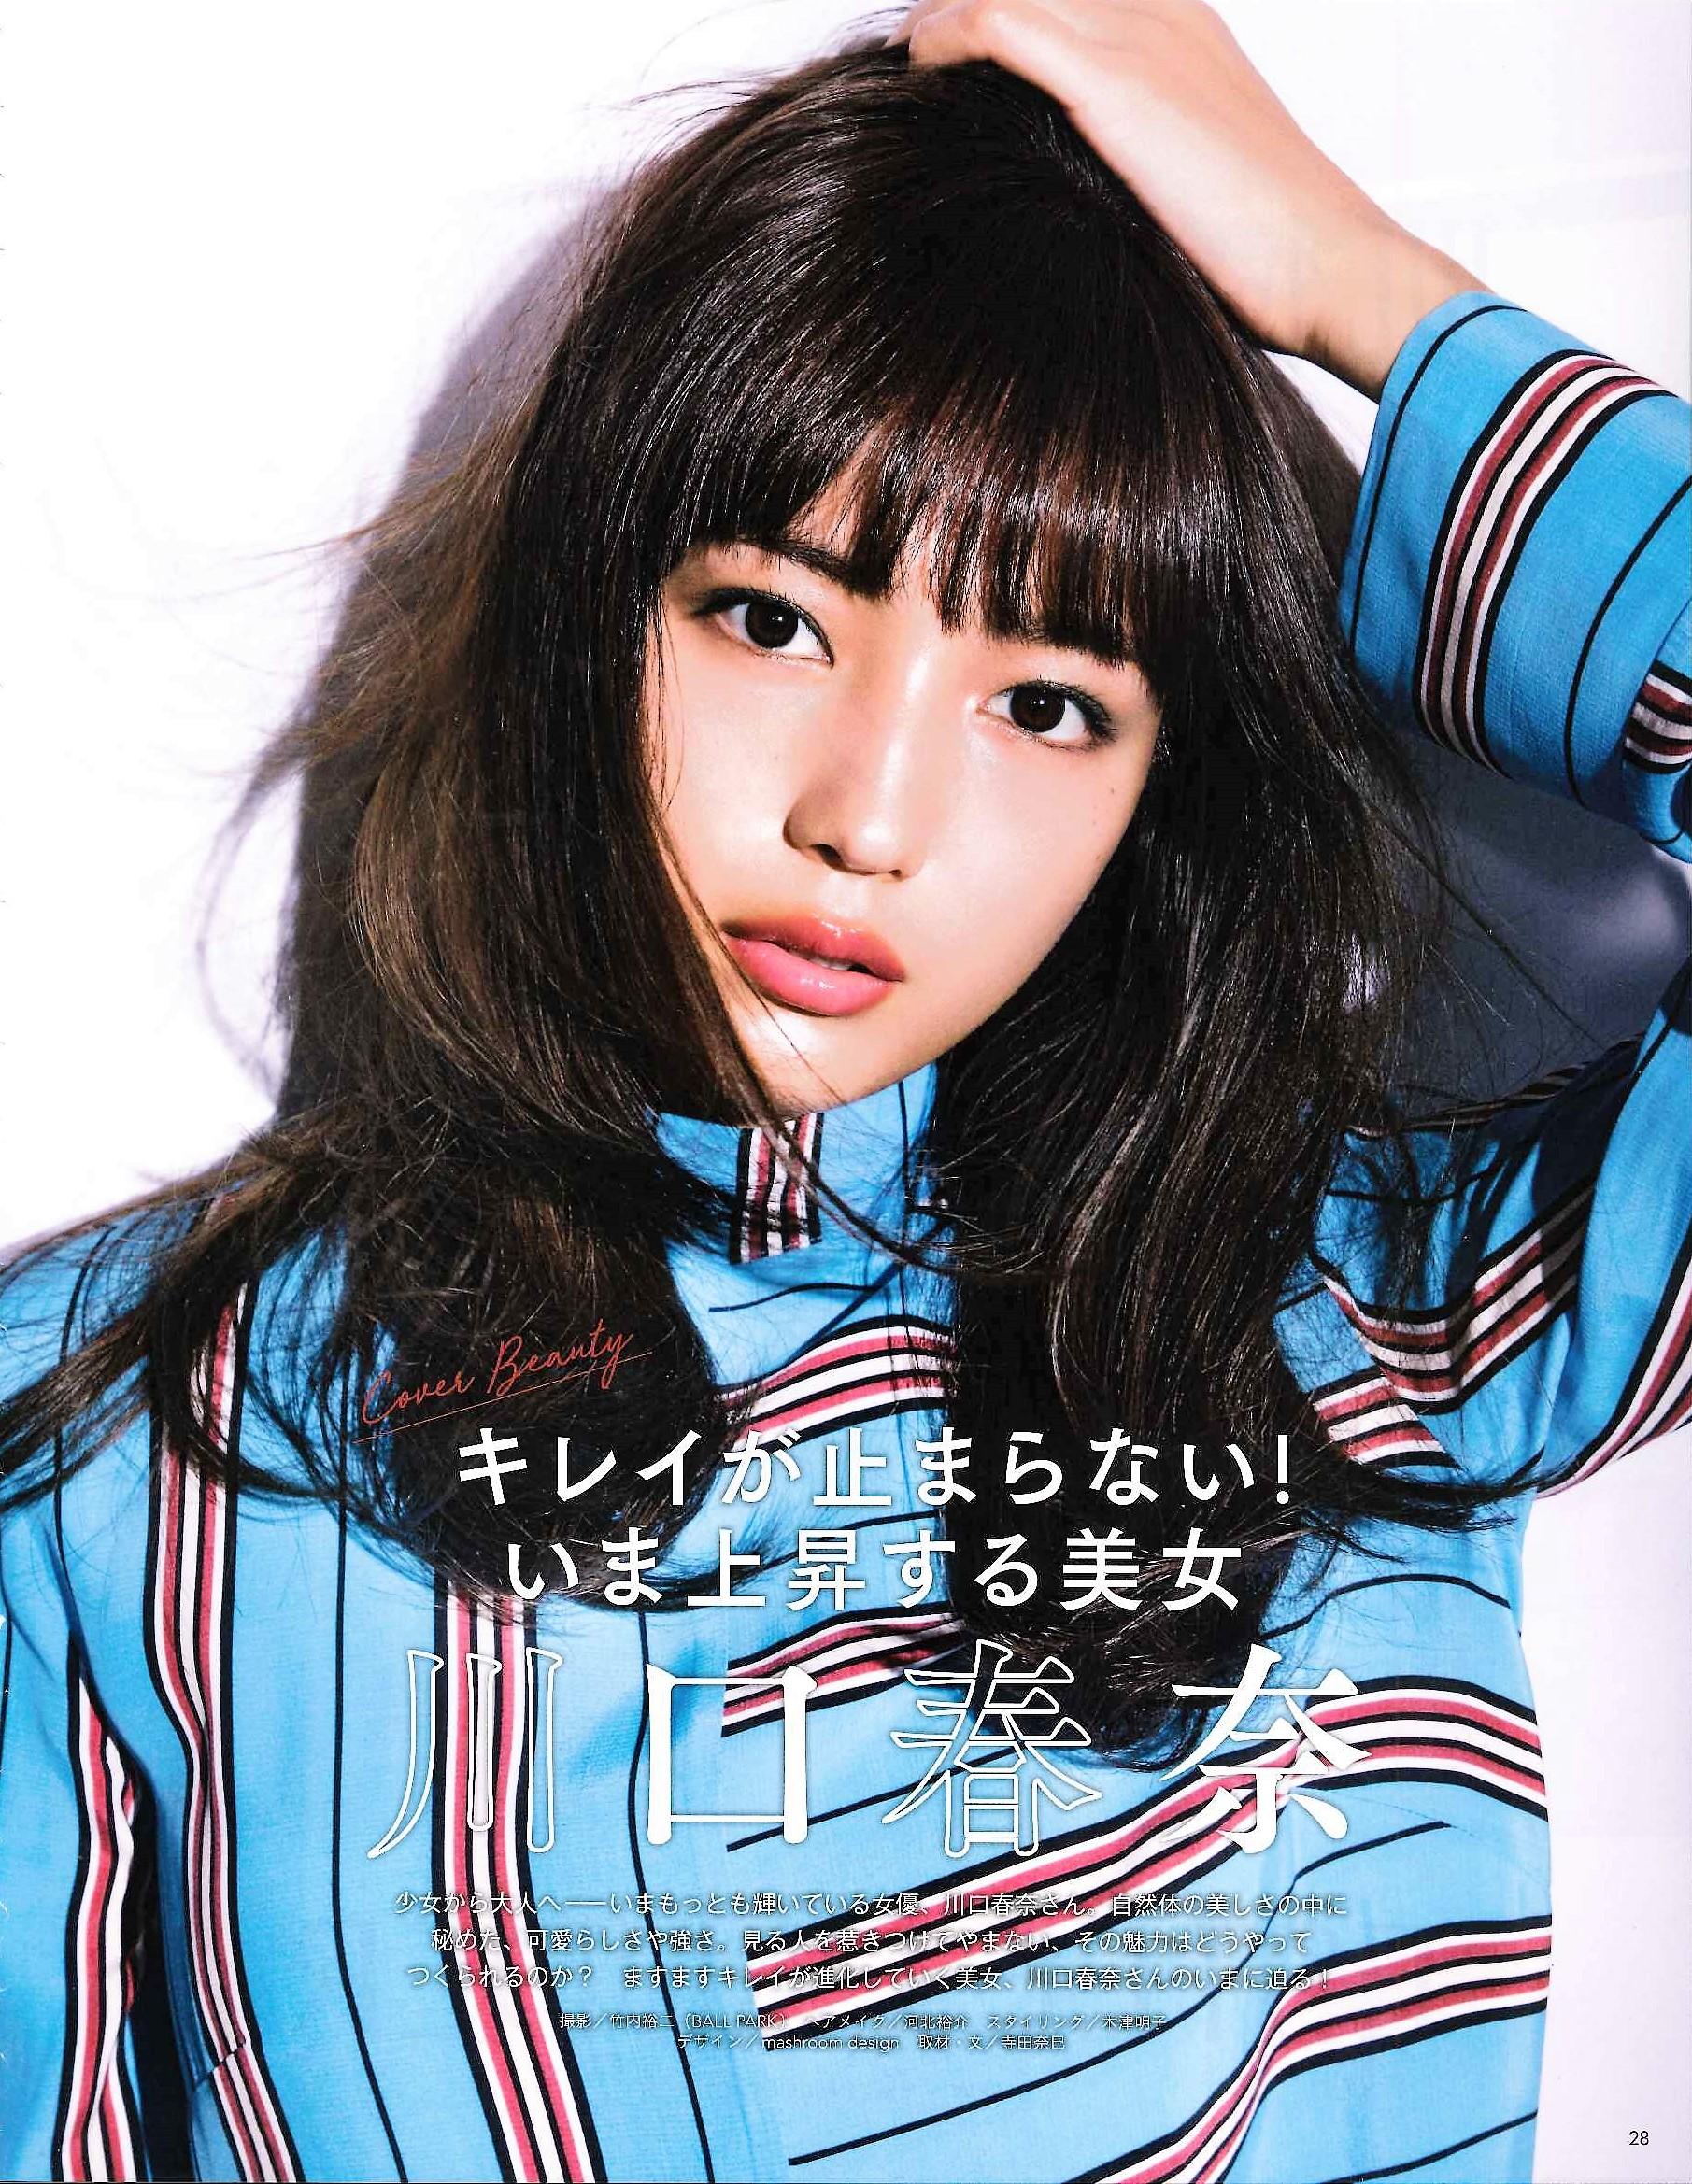 Haruna Kawaguchi nudes (28 foto and video), Sexy, Is a cute, Selfie, lingerie 2006